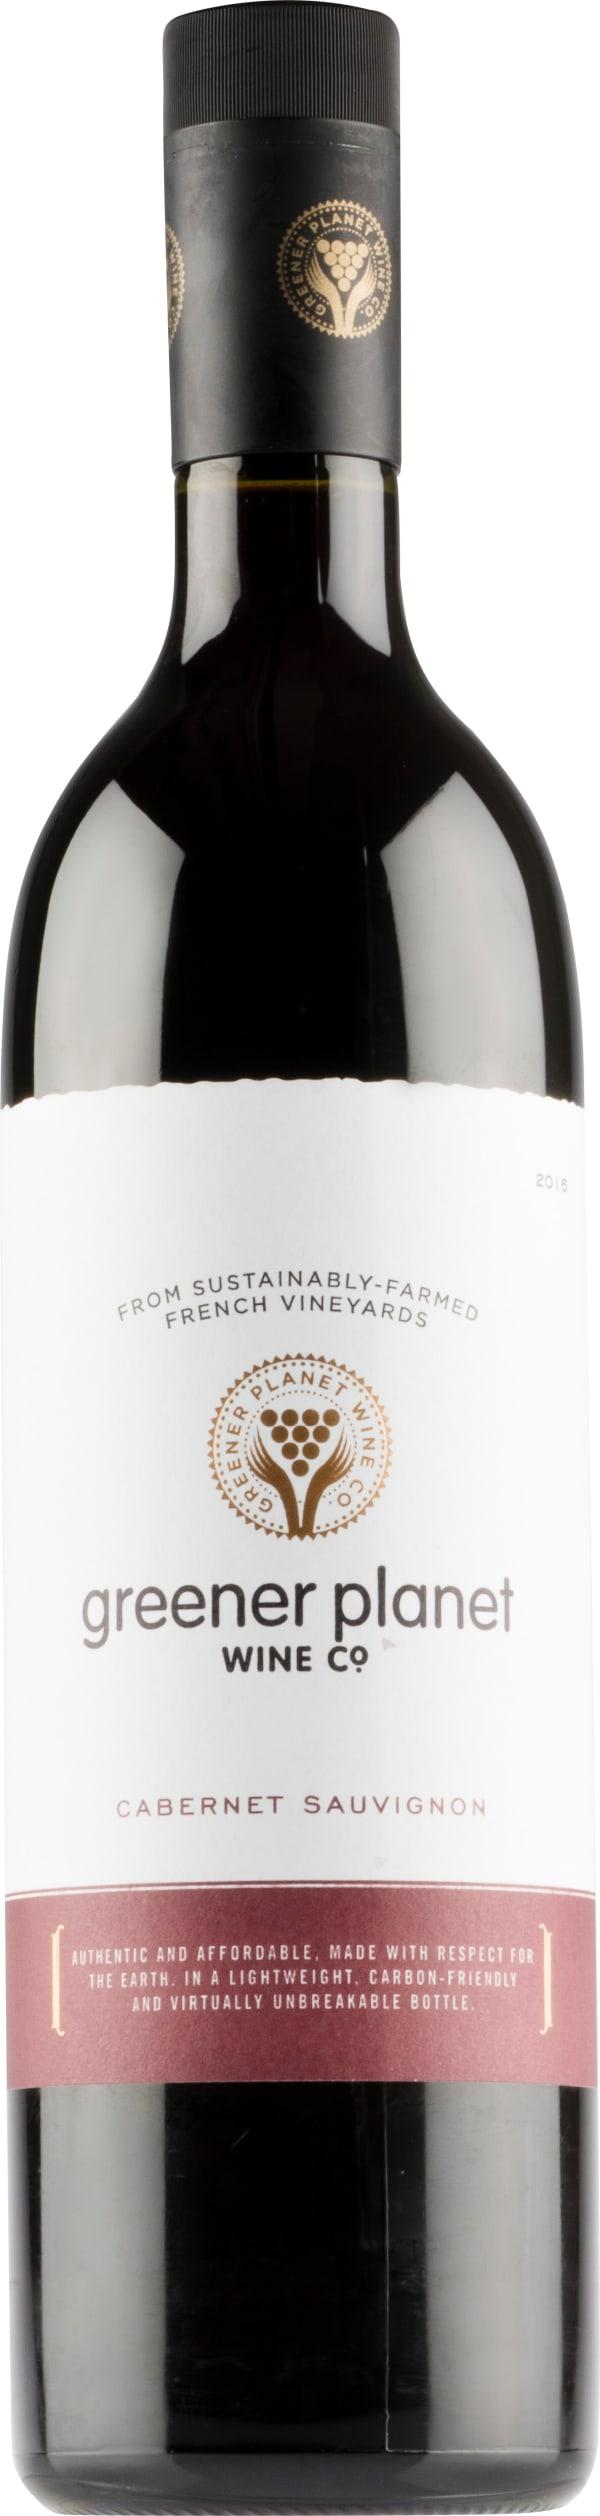 Greener Planet Cabernet Sauvignon 2016 plastic bottle